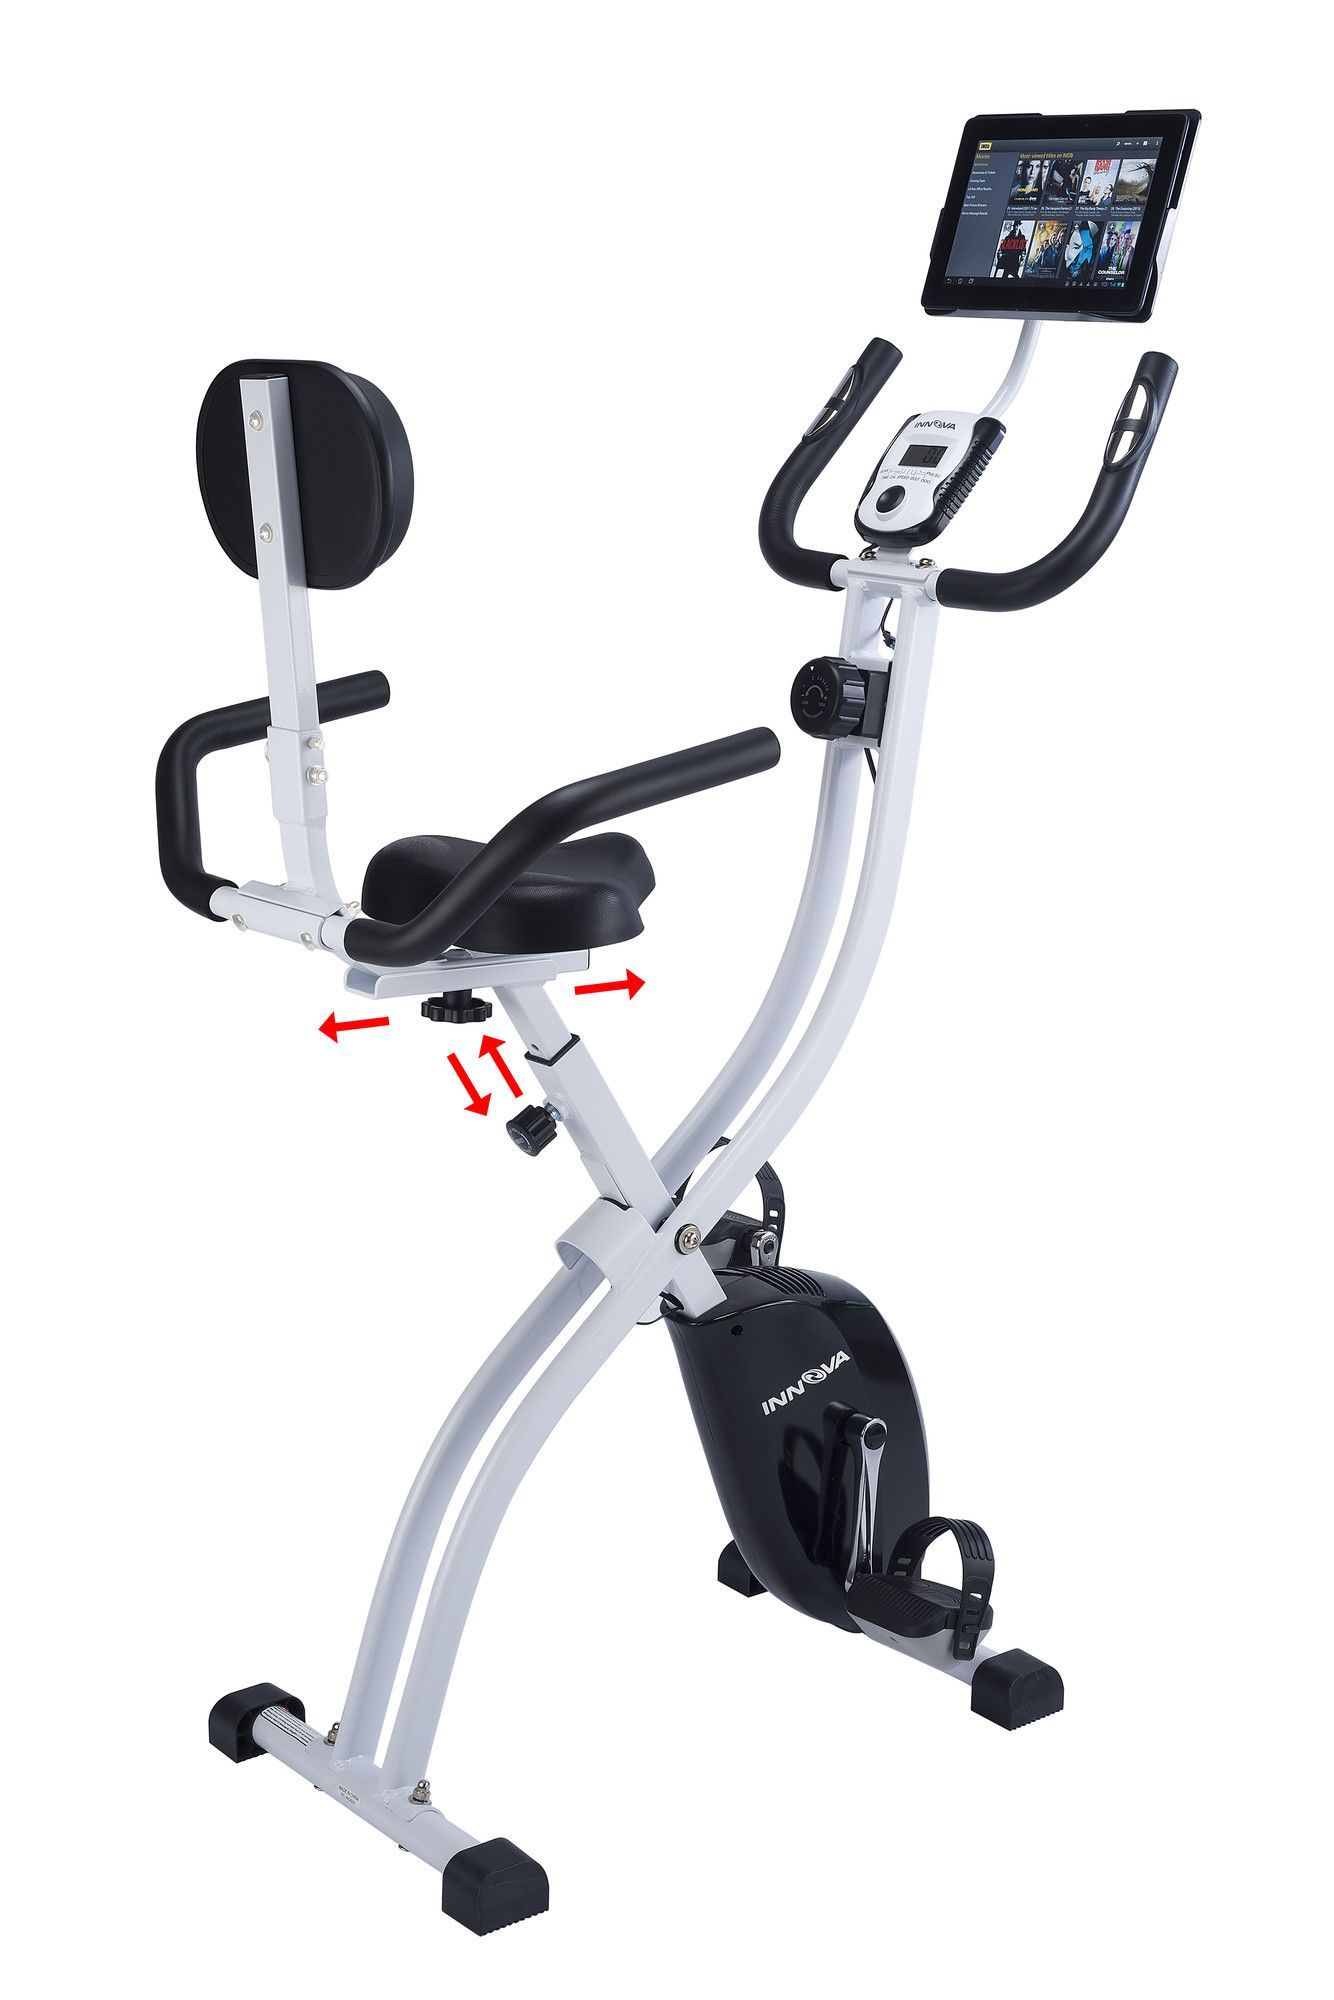 Innova Xbr450 Dual Function Folding Upright Bike With Backrest